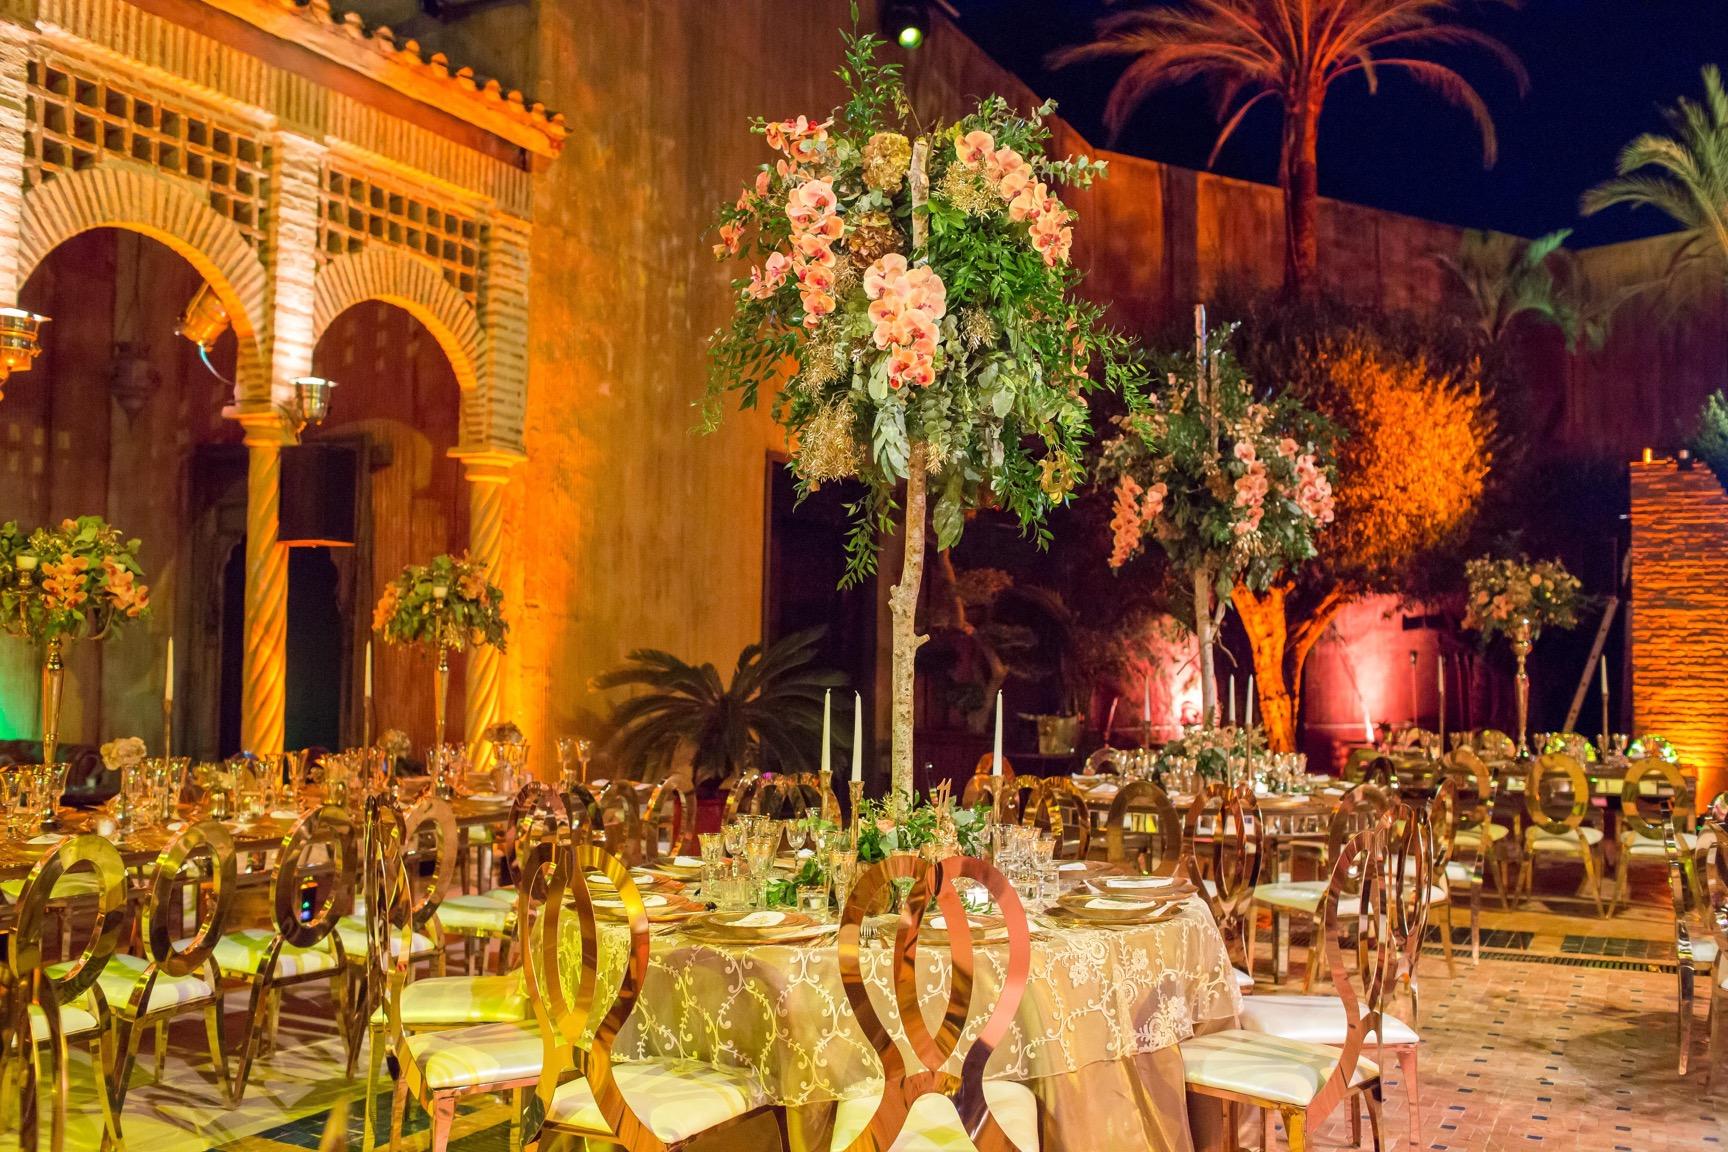 Si-Quiero-Wedding-Planner-By-Sira-Antequera-Bodas-Málaga-Marbella-Miami- L-A-40